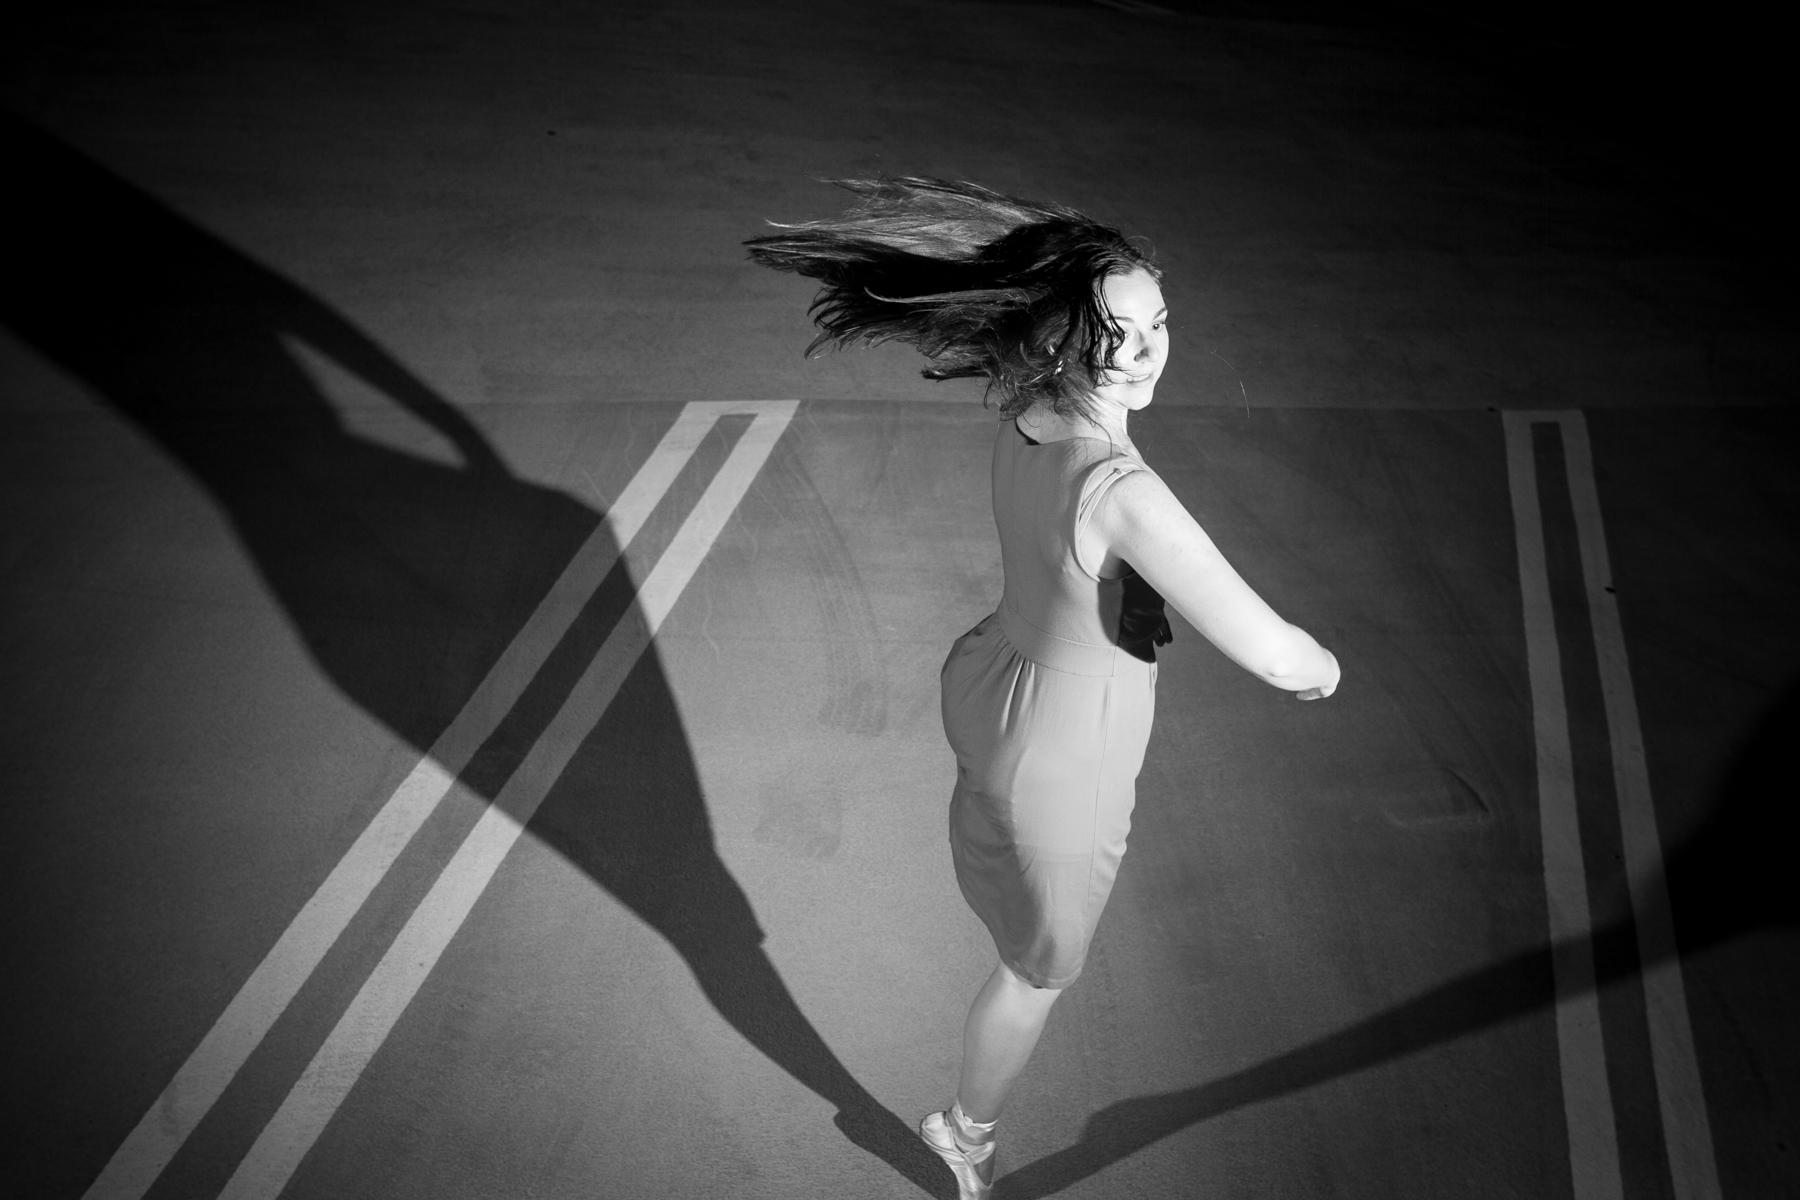 2016_07_28_anne_talkington_durham_dances_ballet_corcoran-103.jpg